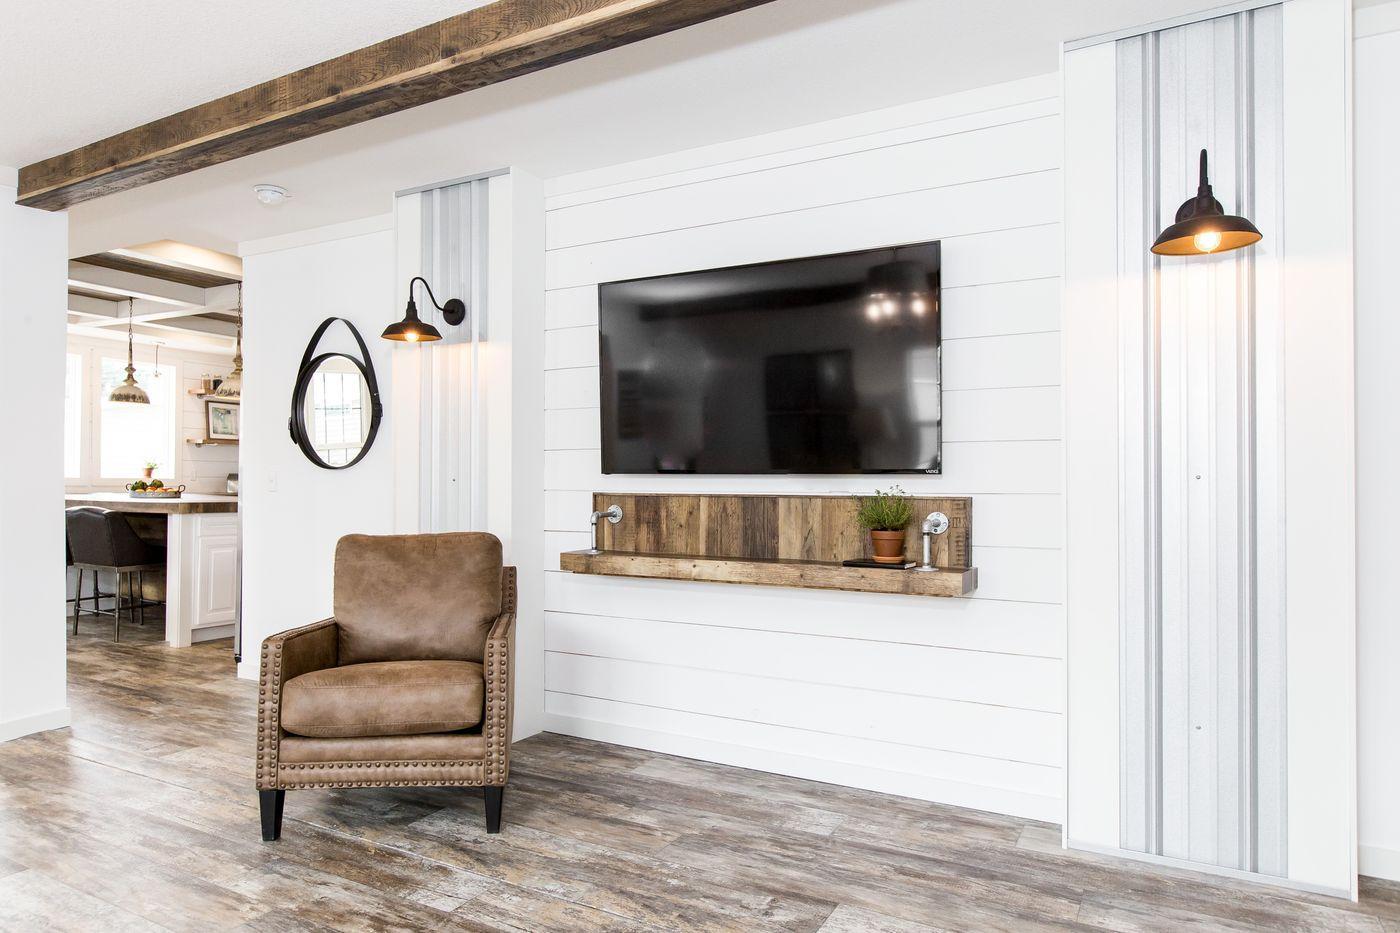 The Lulabelle Living Room